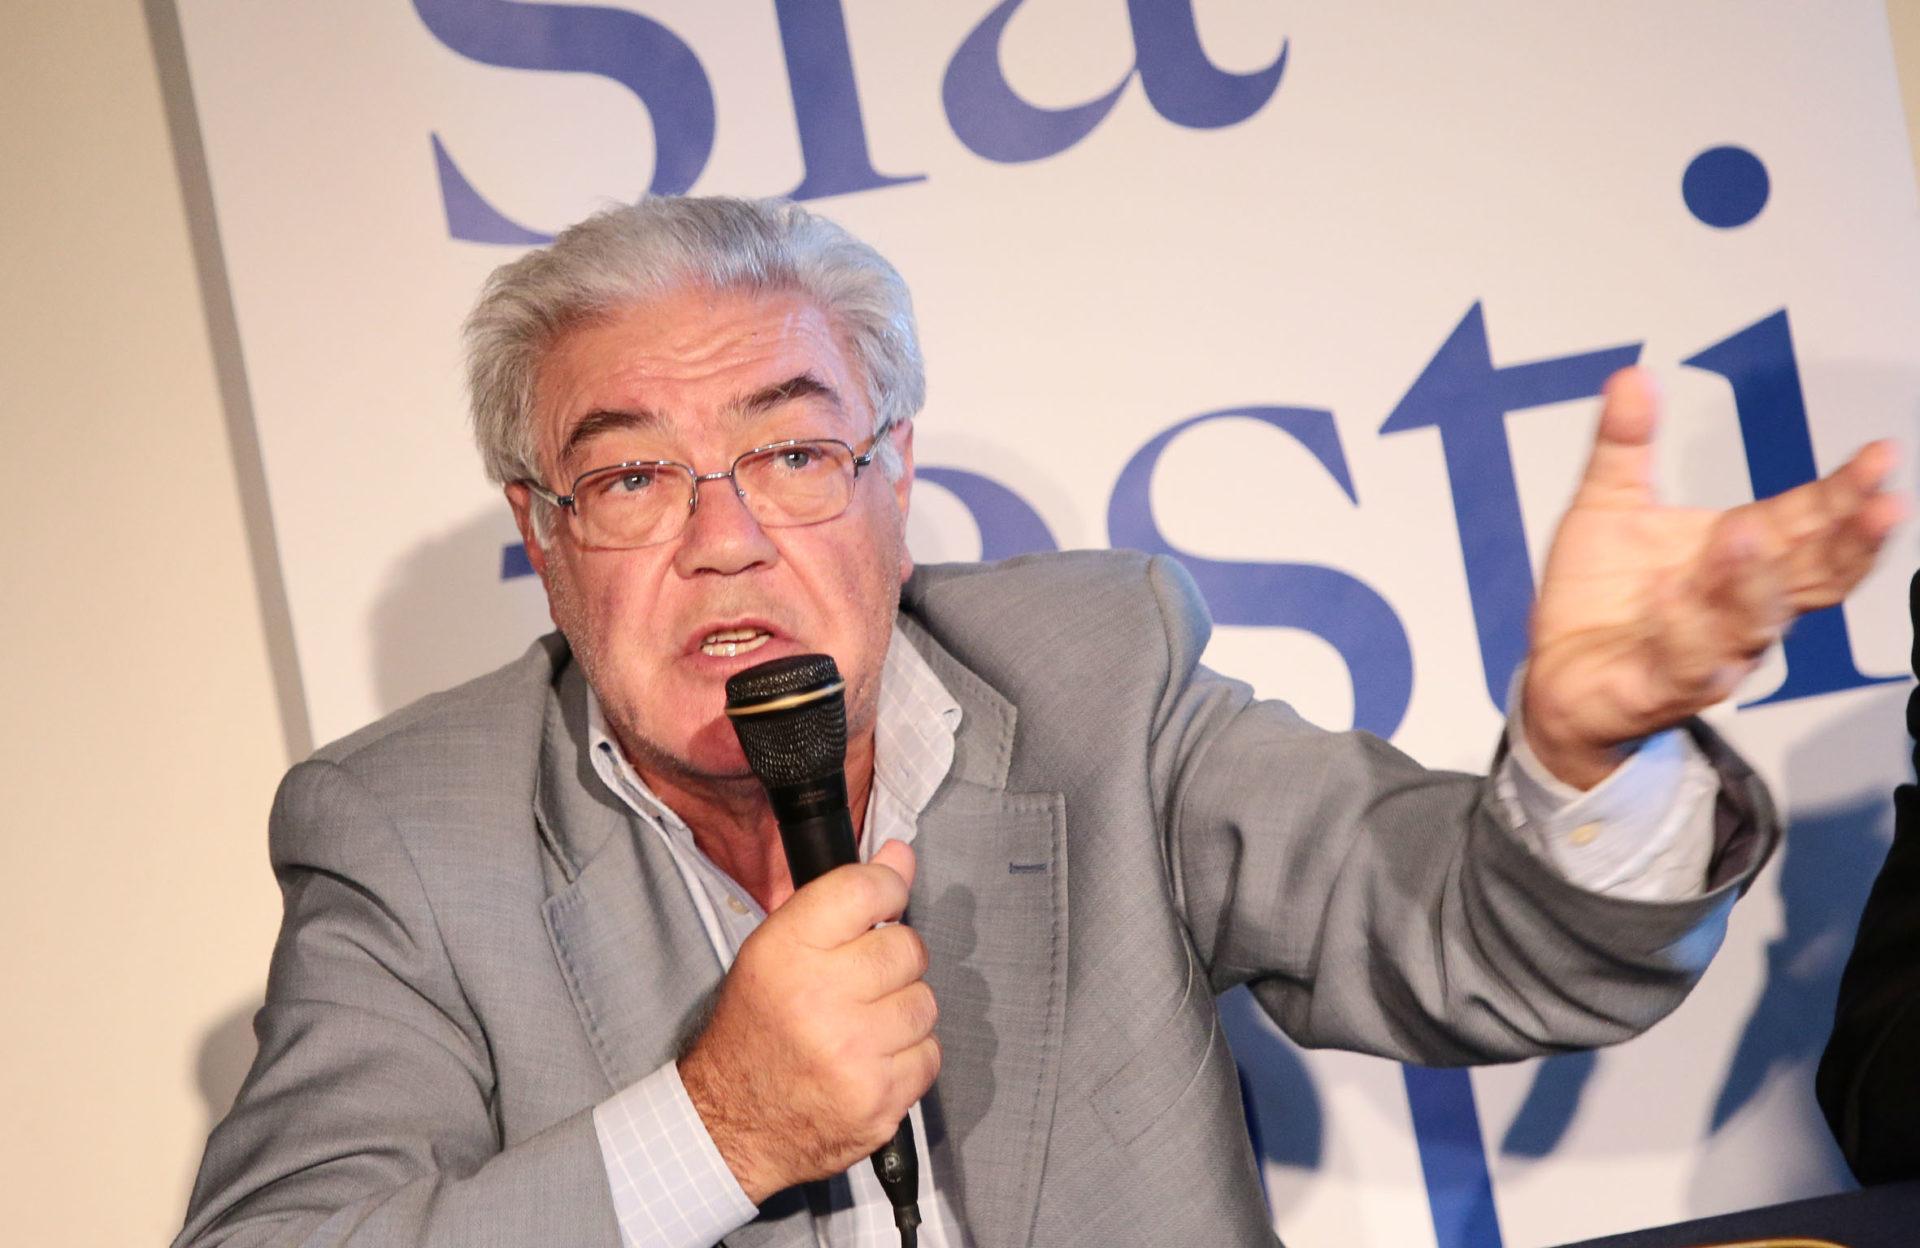 Nino De Vita a Poesia Festival '17 - photo © Elisabetta Baracchi